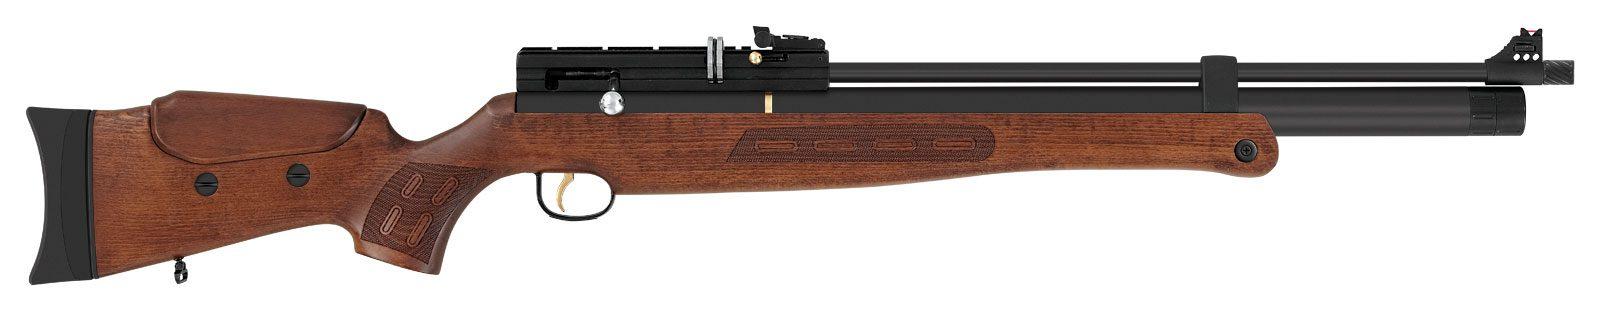 BT65SB-W